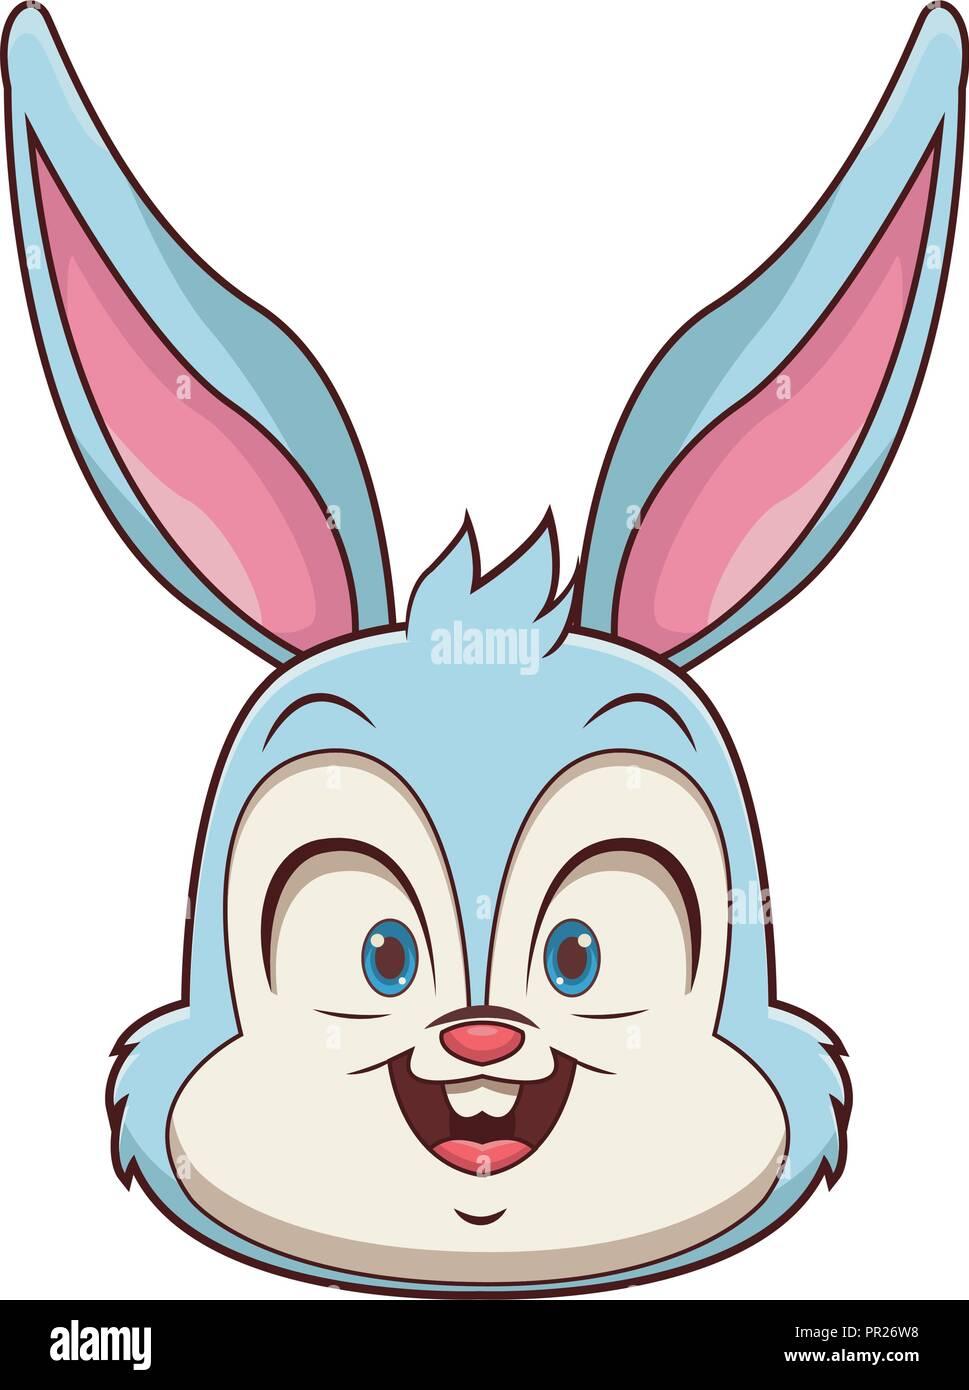 Rabbit Cartoon Face Stock Vector Image Art Alamy